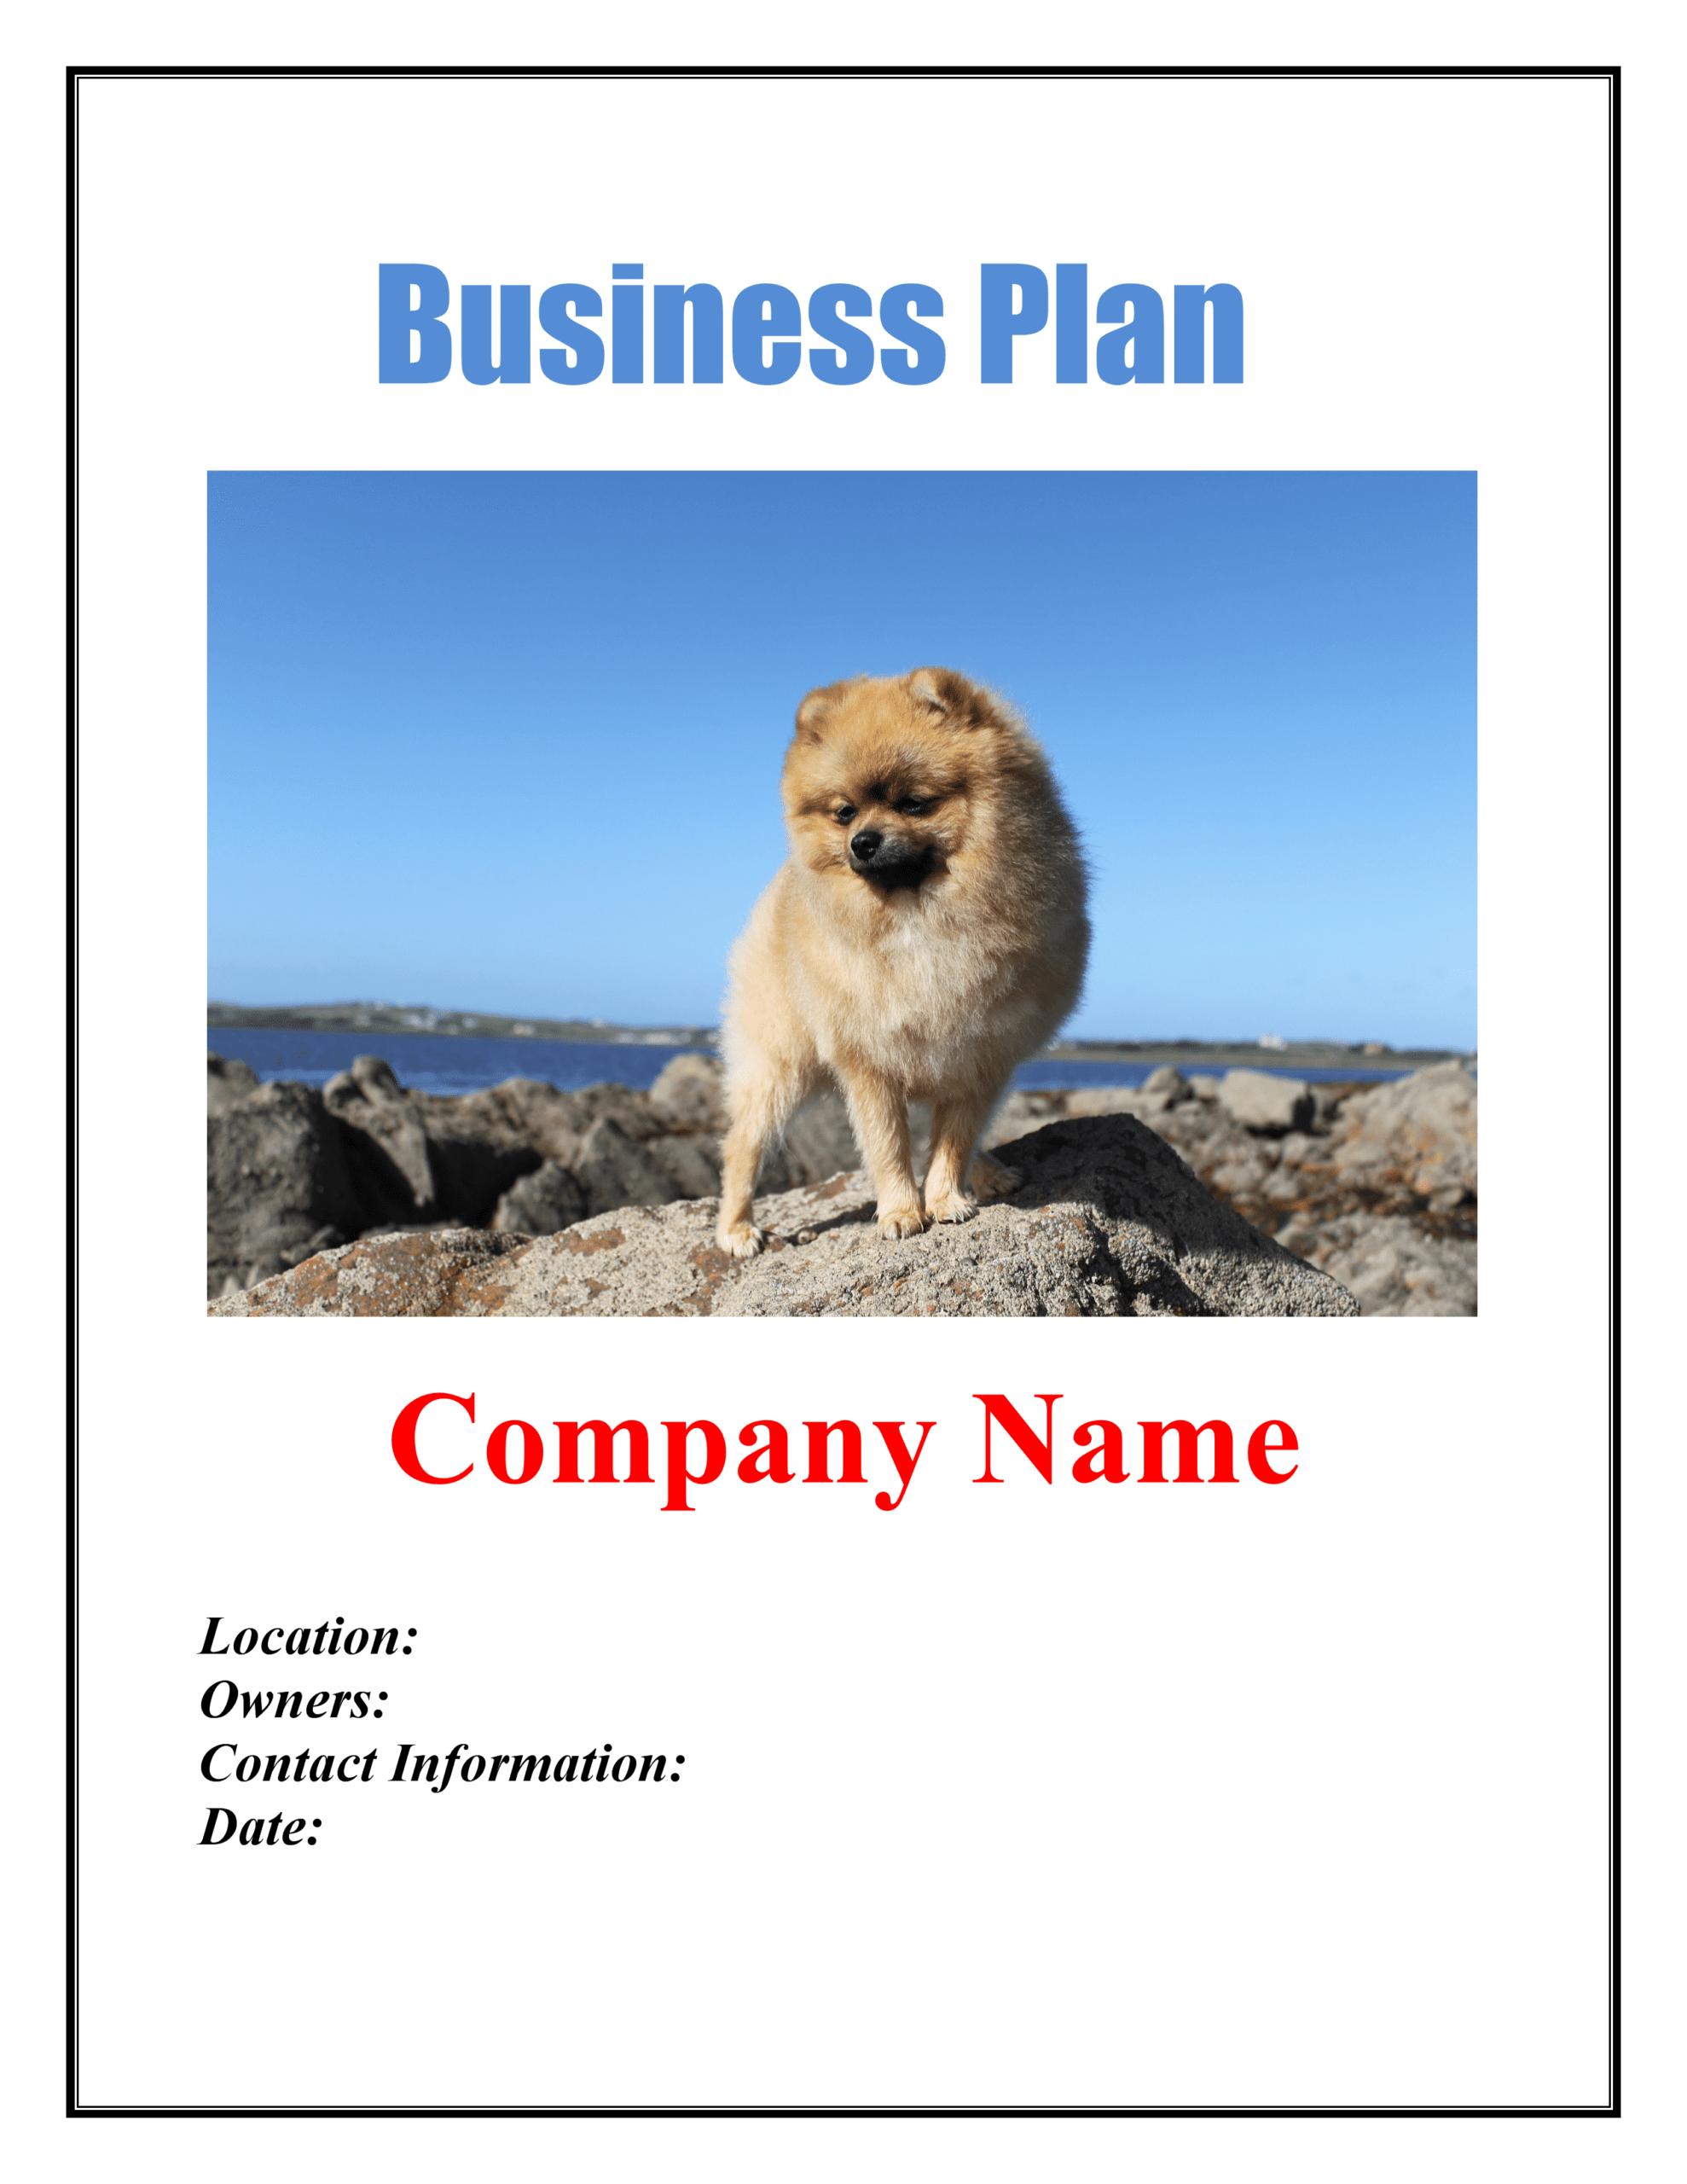 Dog Breeding Business Plan Template Sample Pages - Black Box For Dog Breeding Business Plan Template